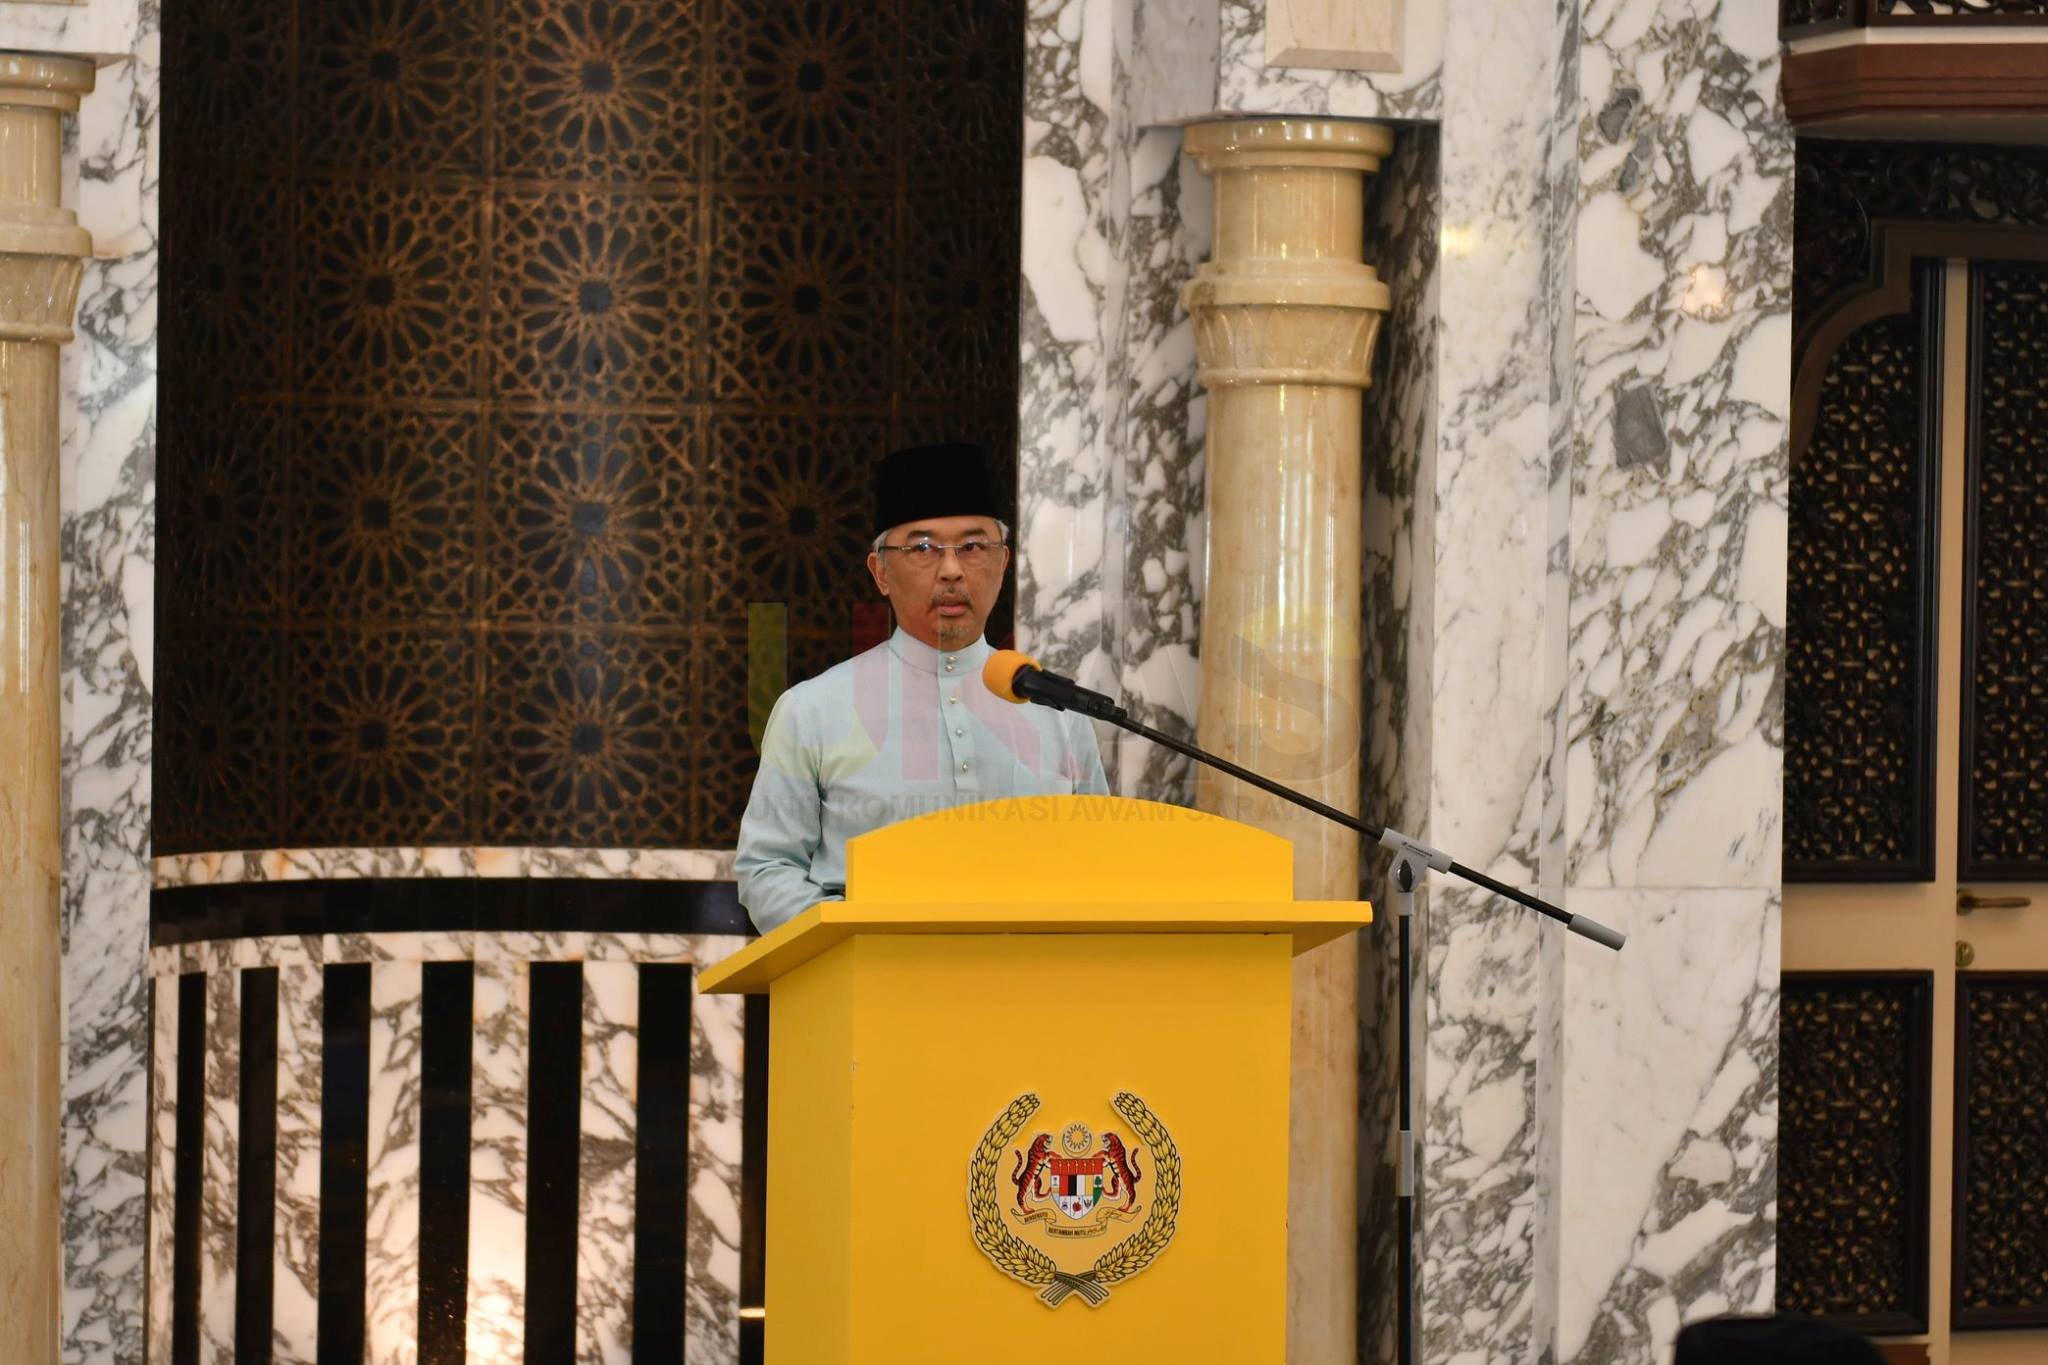 Yang di-Pertuan Agong kagum dengan pembangunan yang dinikmati Sarawak